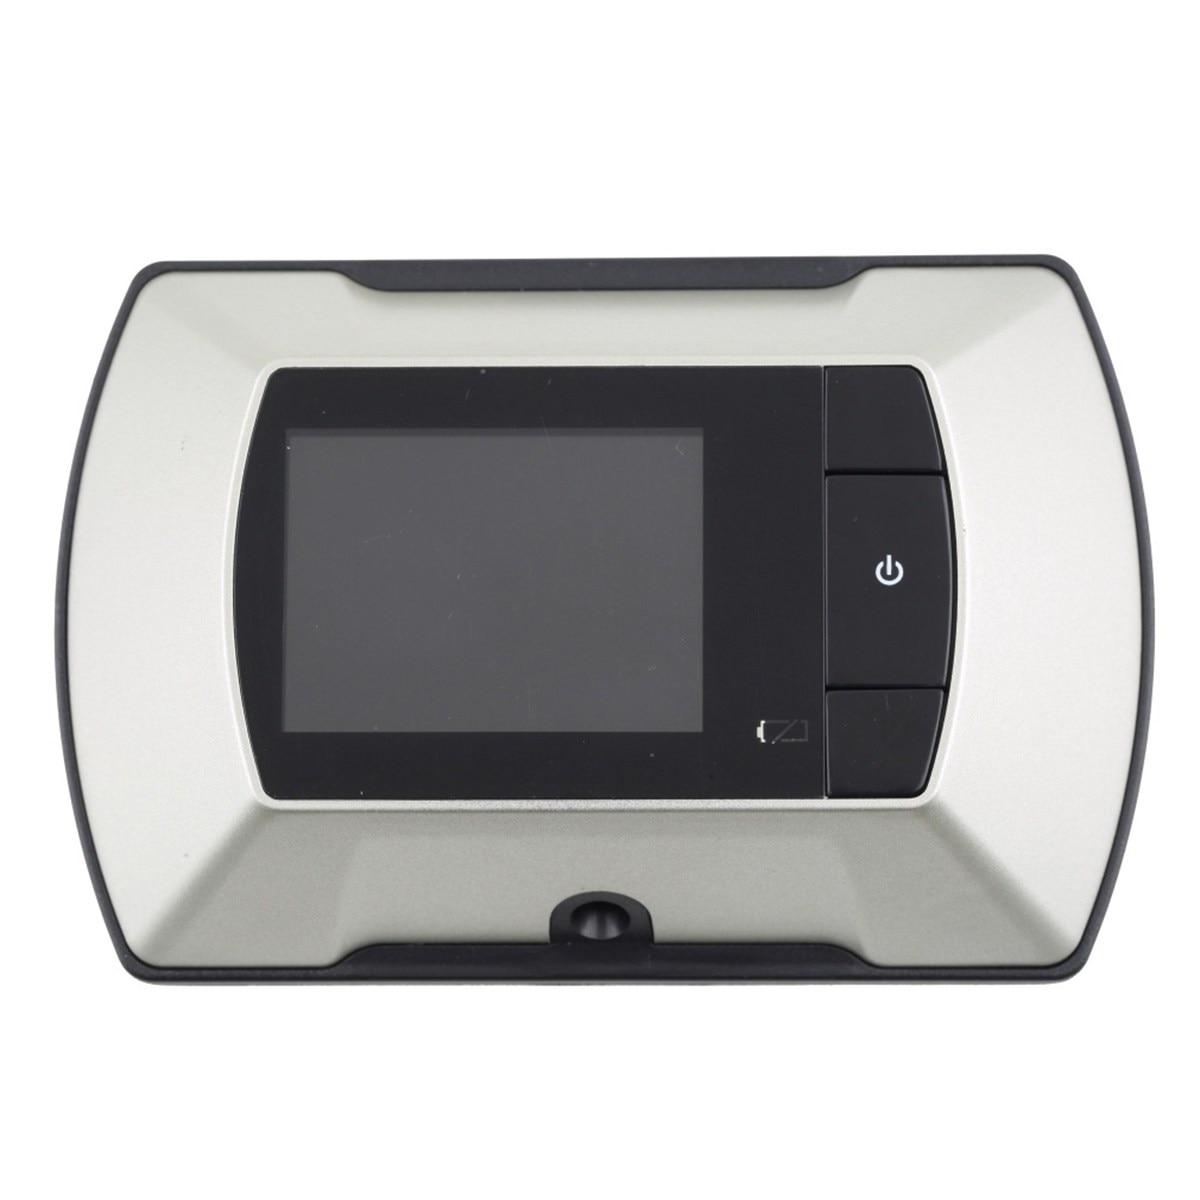 все цены на NEW Safurance 2.4'' LCD Digital Screen Peephole Viewer Door Eye Doorbell Camera Home Security Safety Door Intercom онлайн